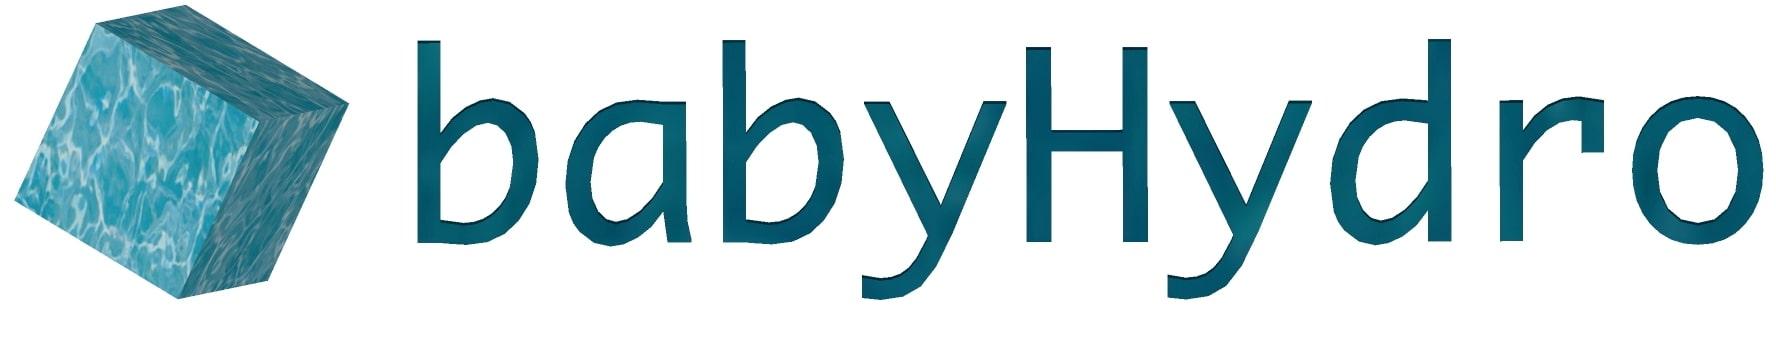 BabyHydro